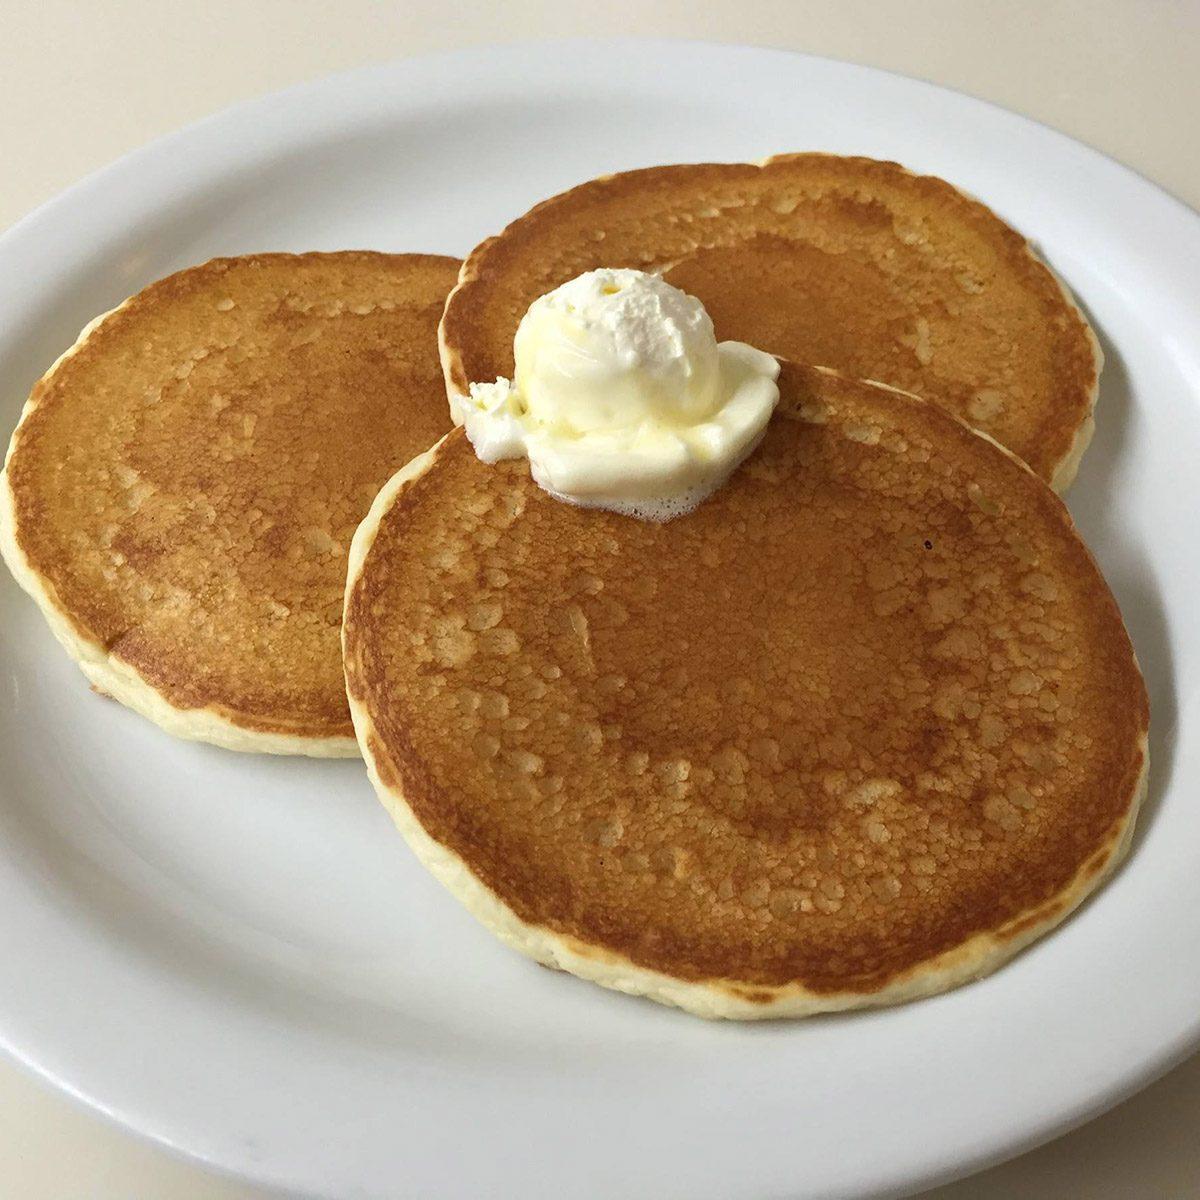 Smitty's Pancake and Steak House, Idaho Falls pancakes